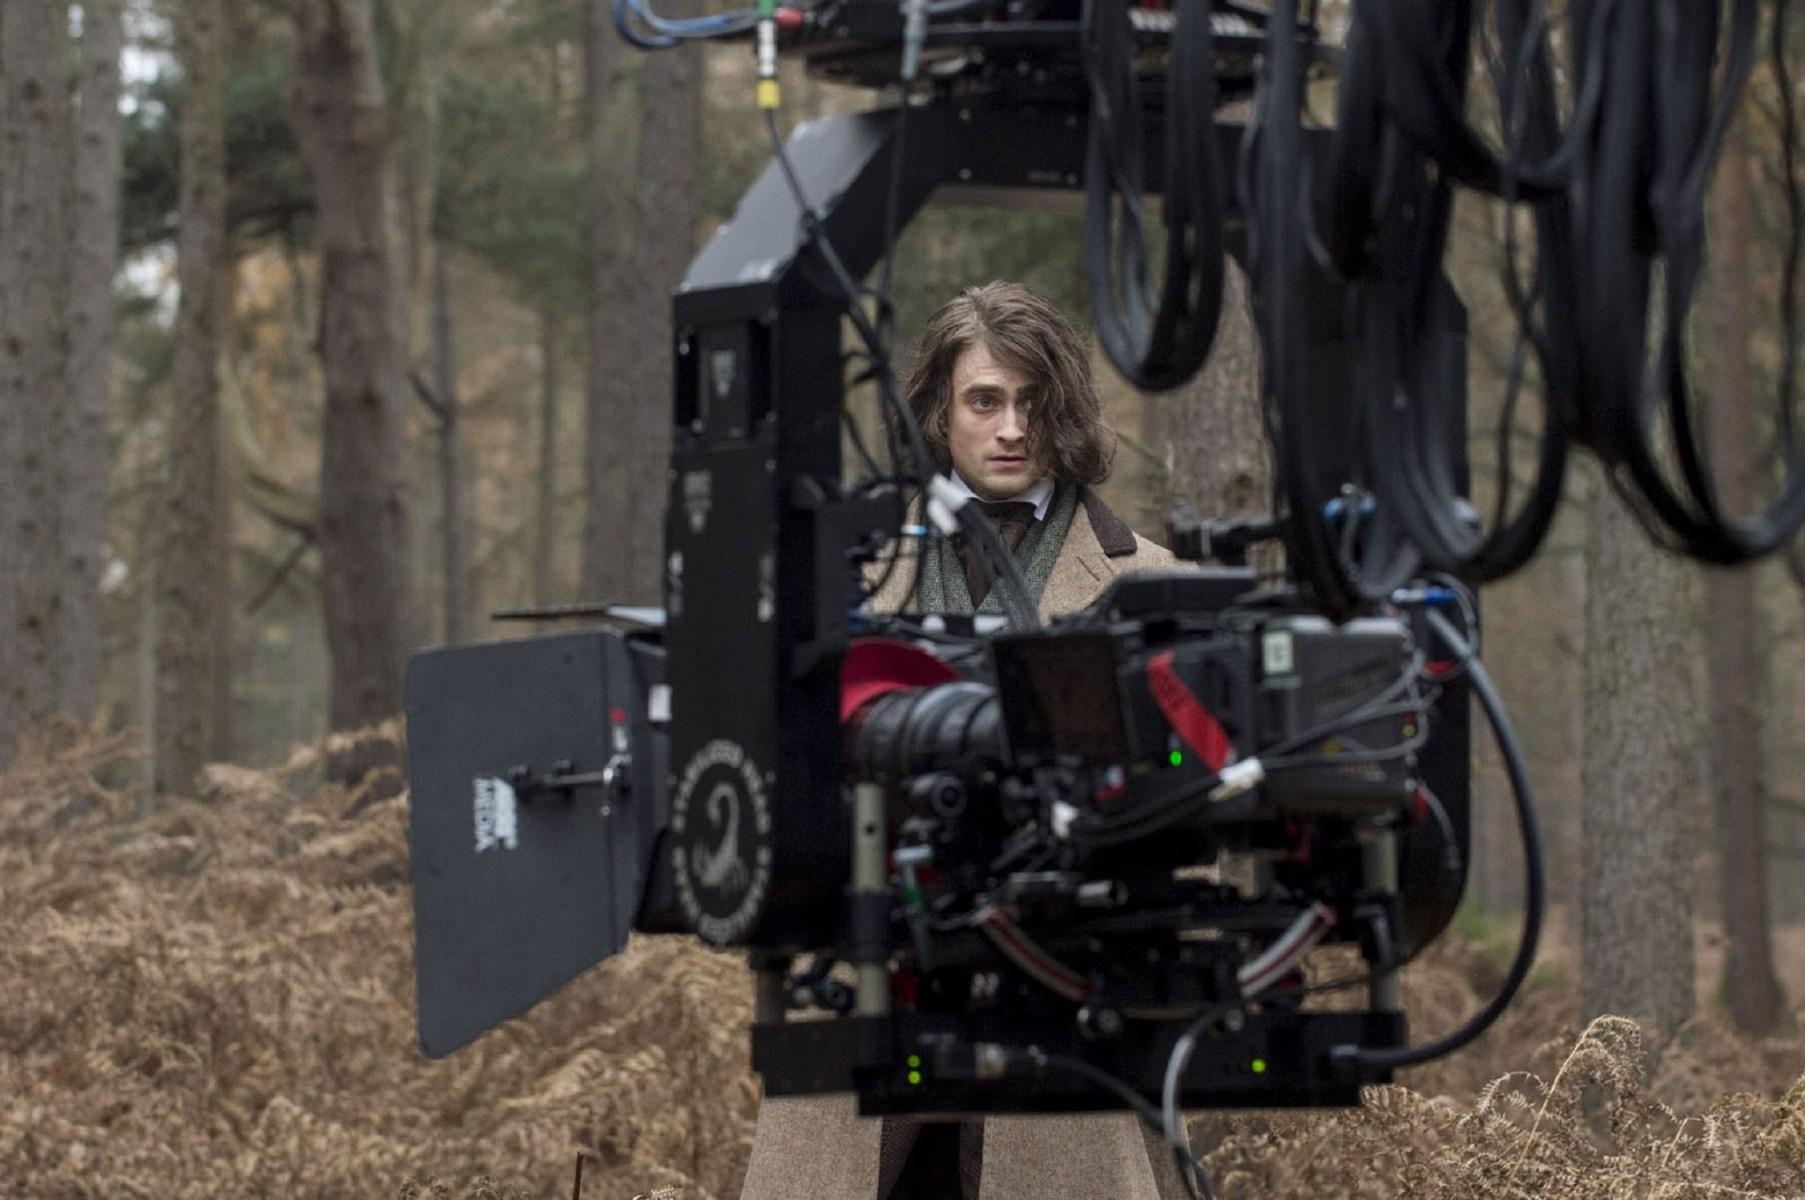 On Location : Victor Frankenstein (2015) Behind the Scenes